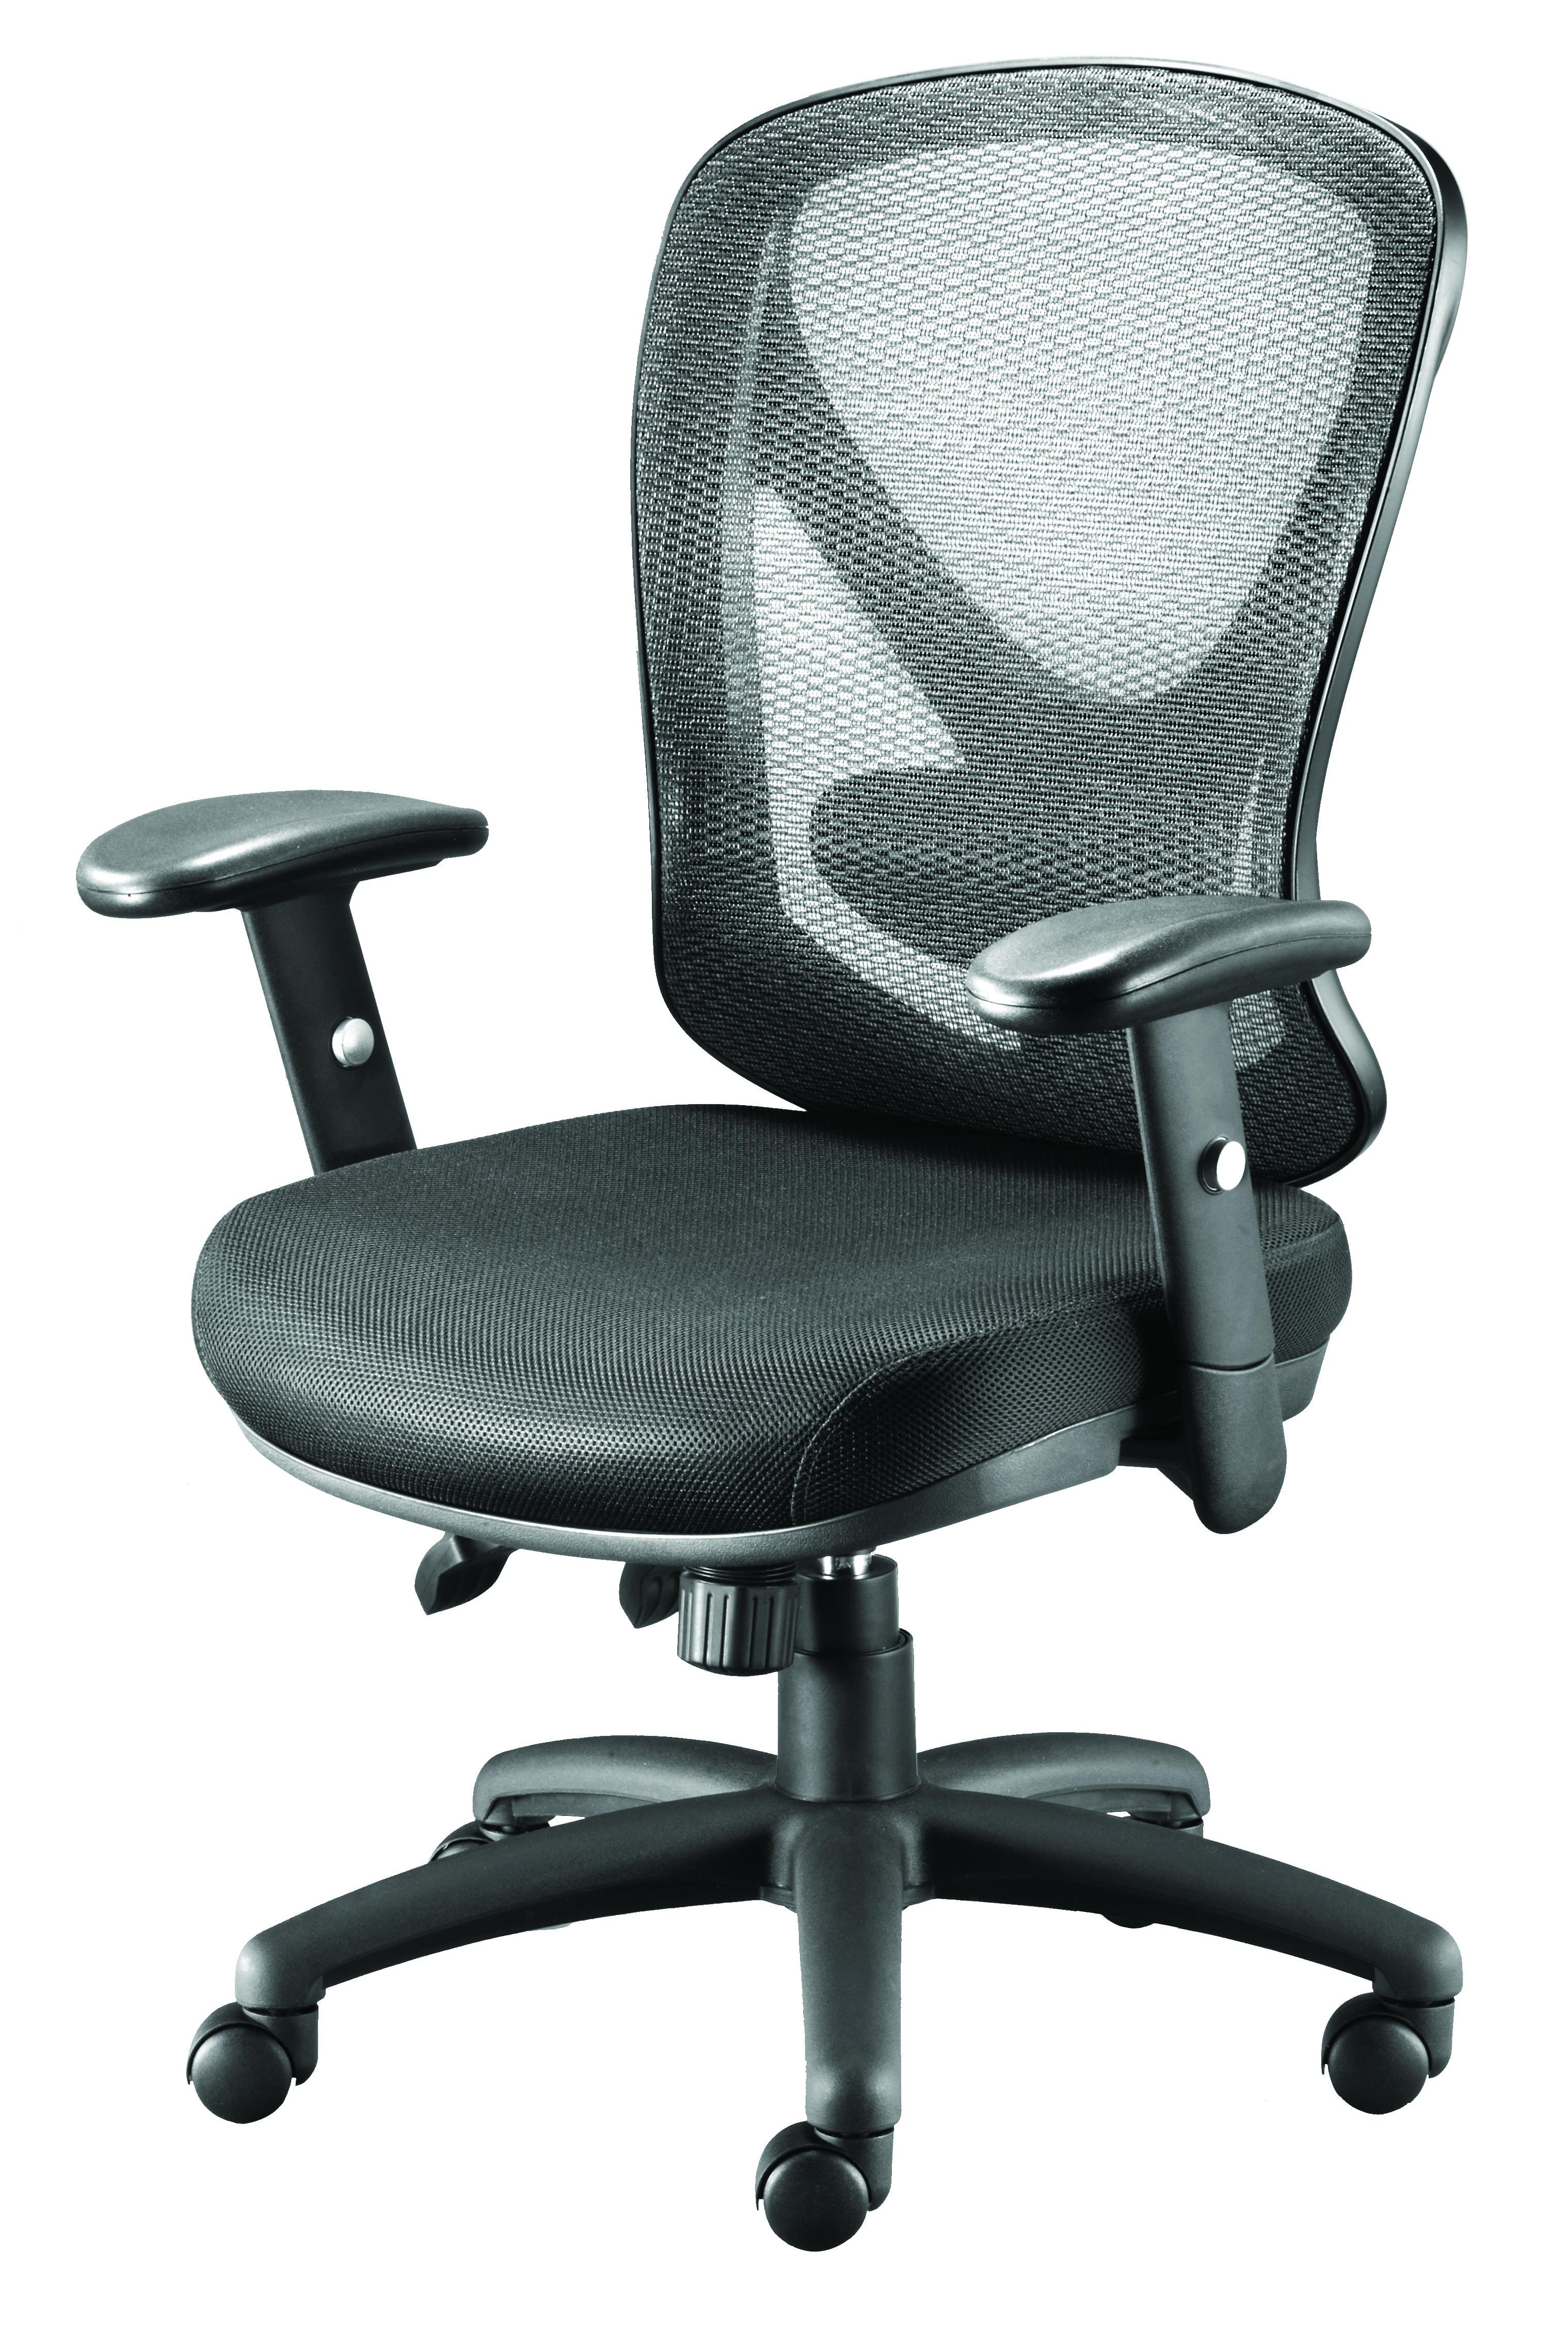 staples carder mesh office chair black ebay. Black Bedroom Furniture Sets. Home Design Ideas